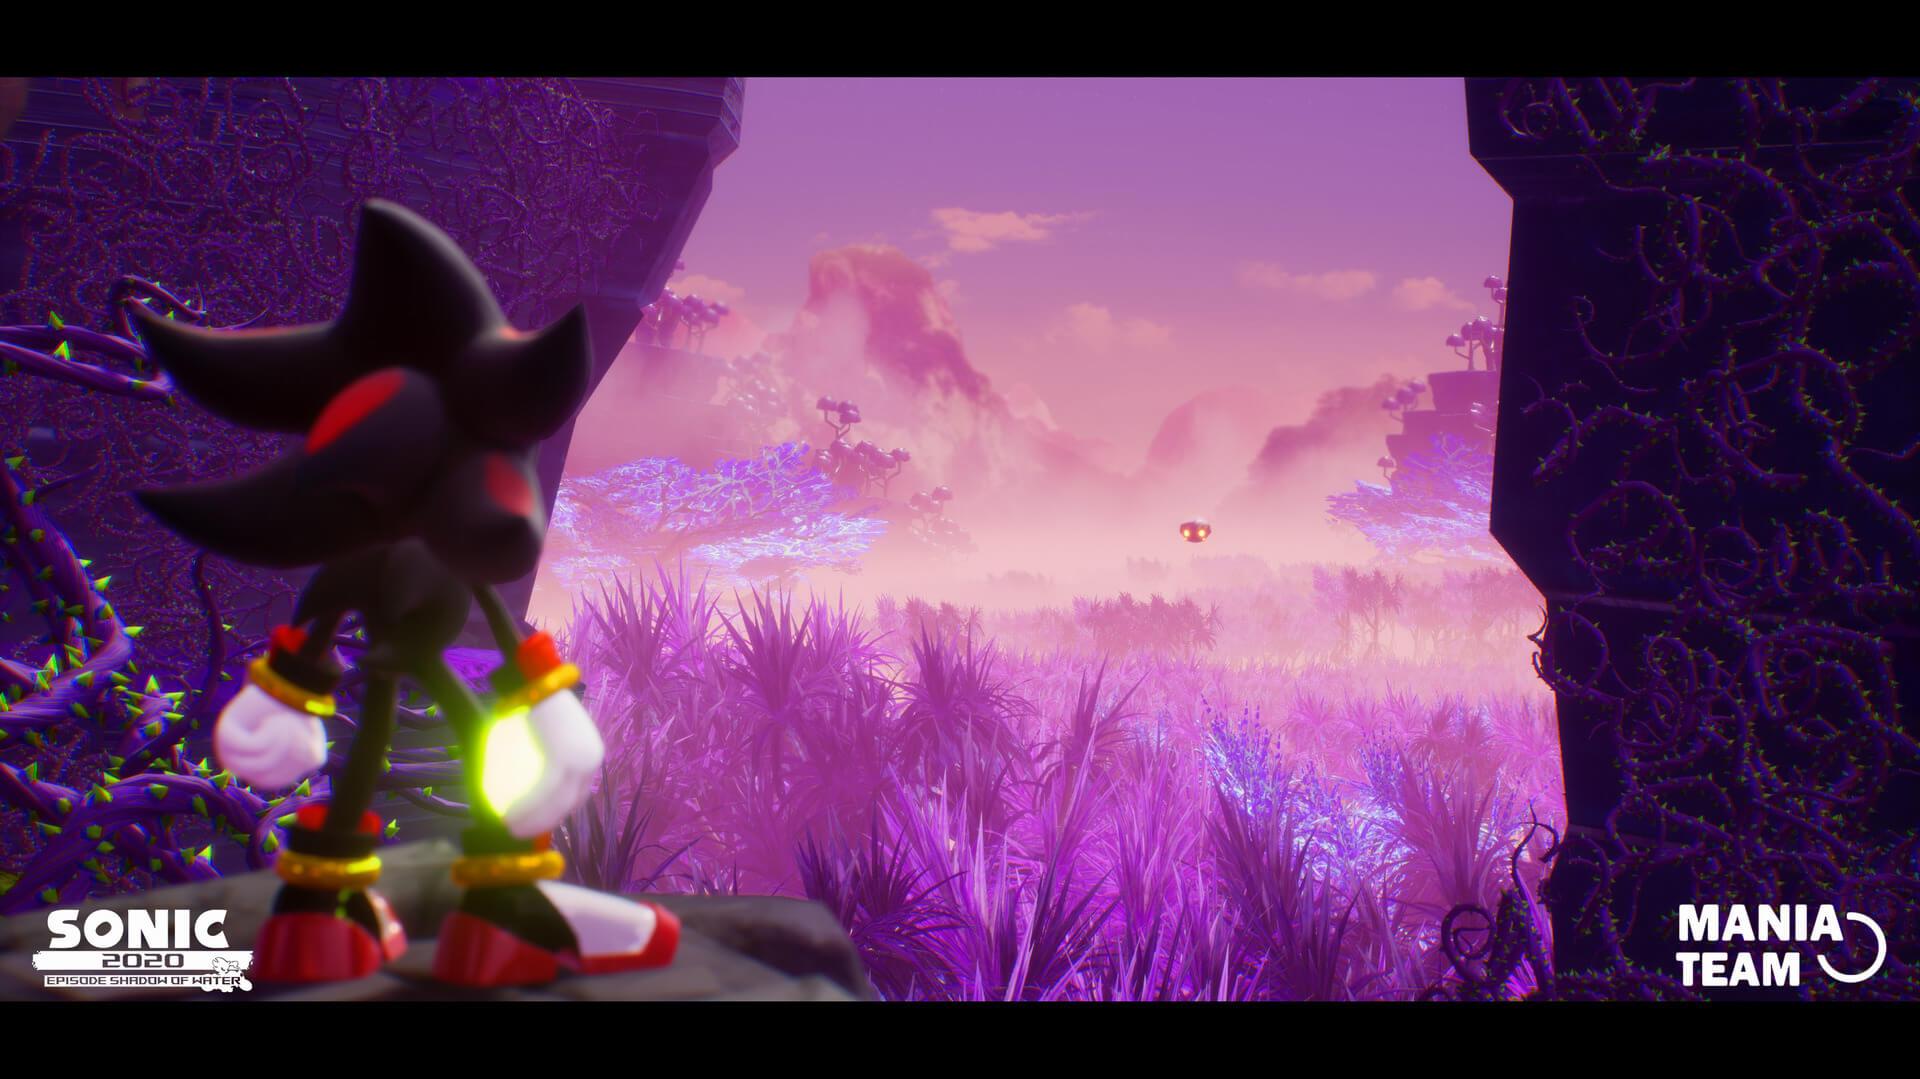 Sonic 2020 - впечатляющая фанатская игра на Unreal Engine 4